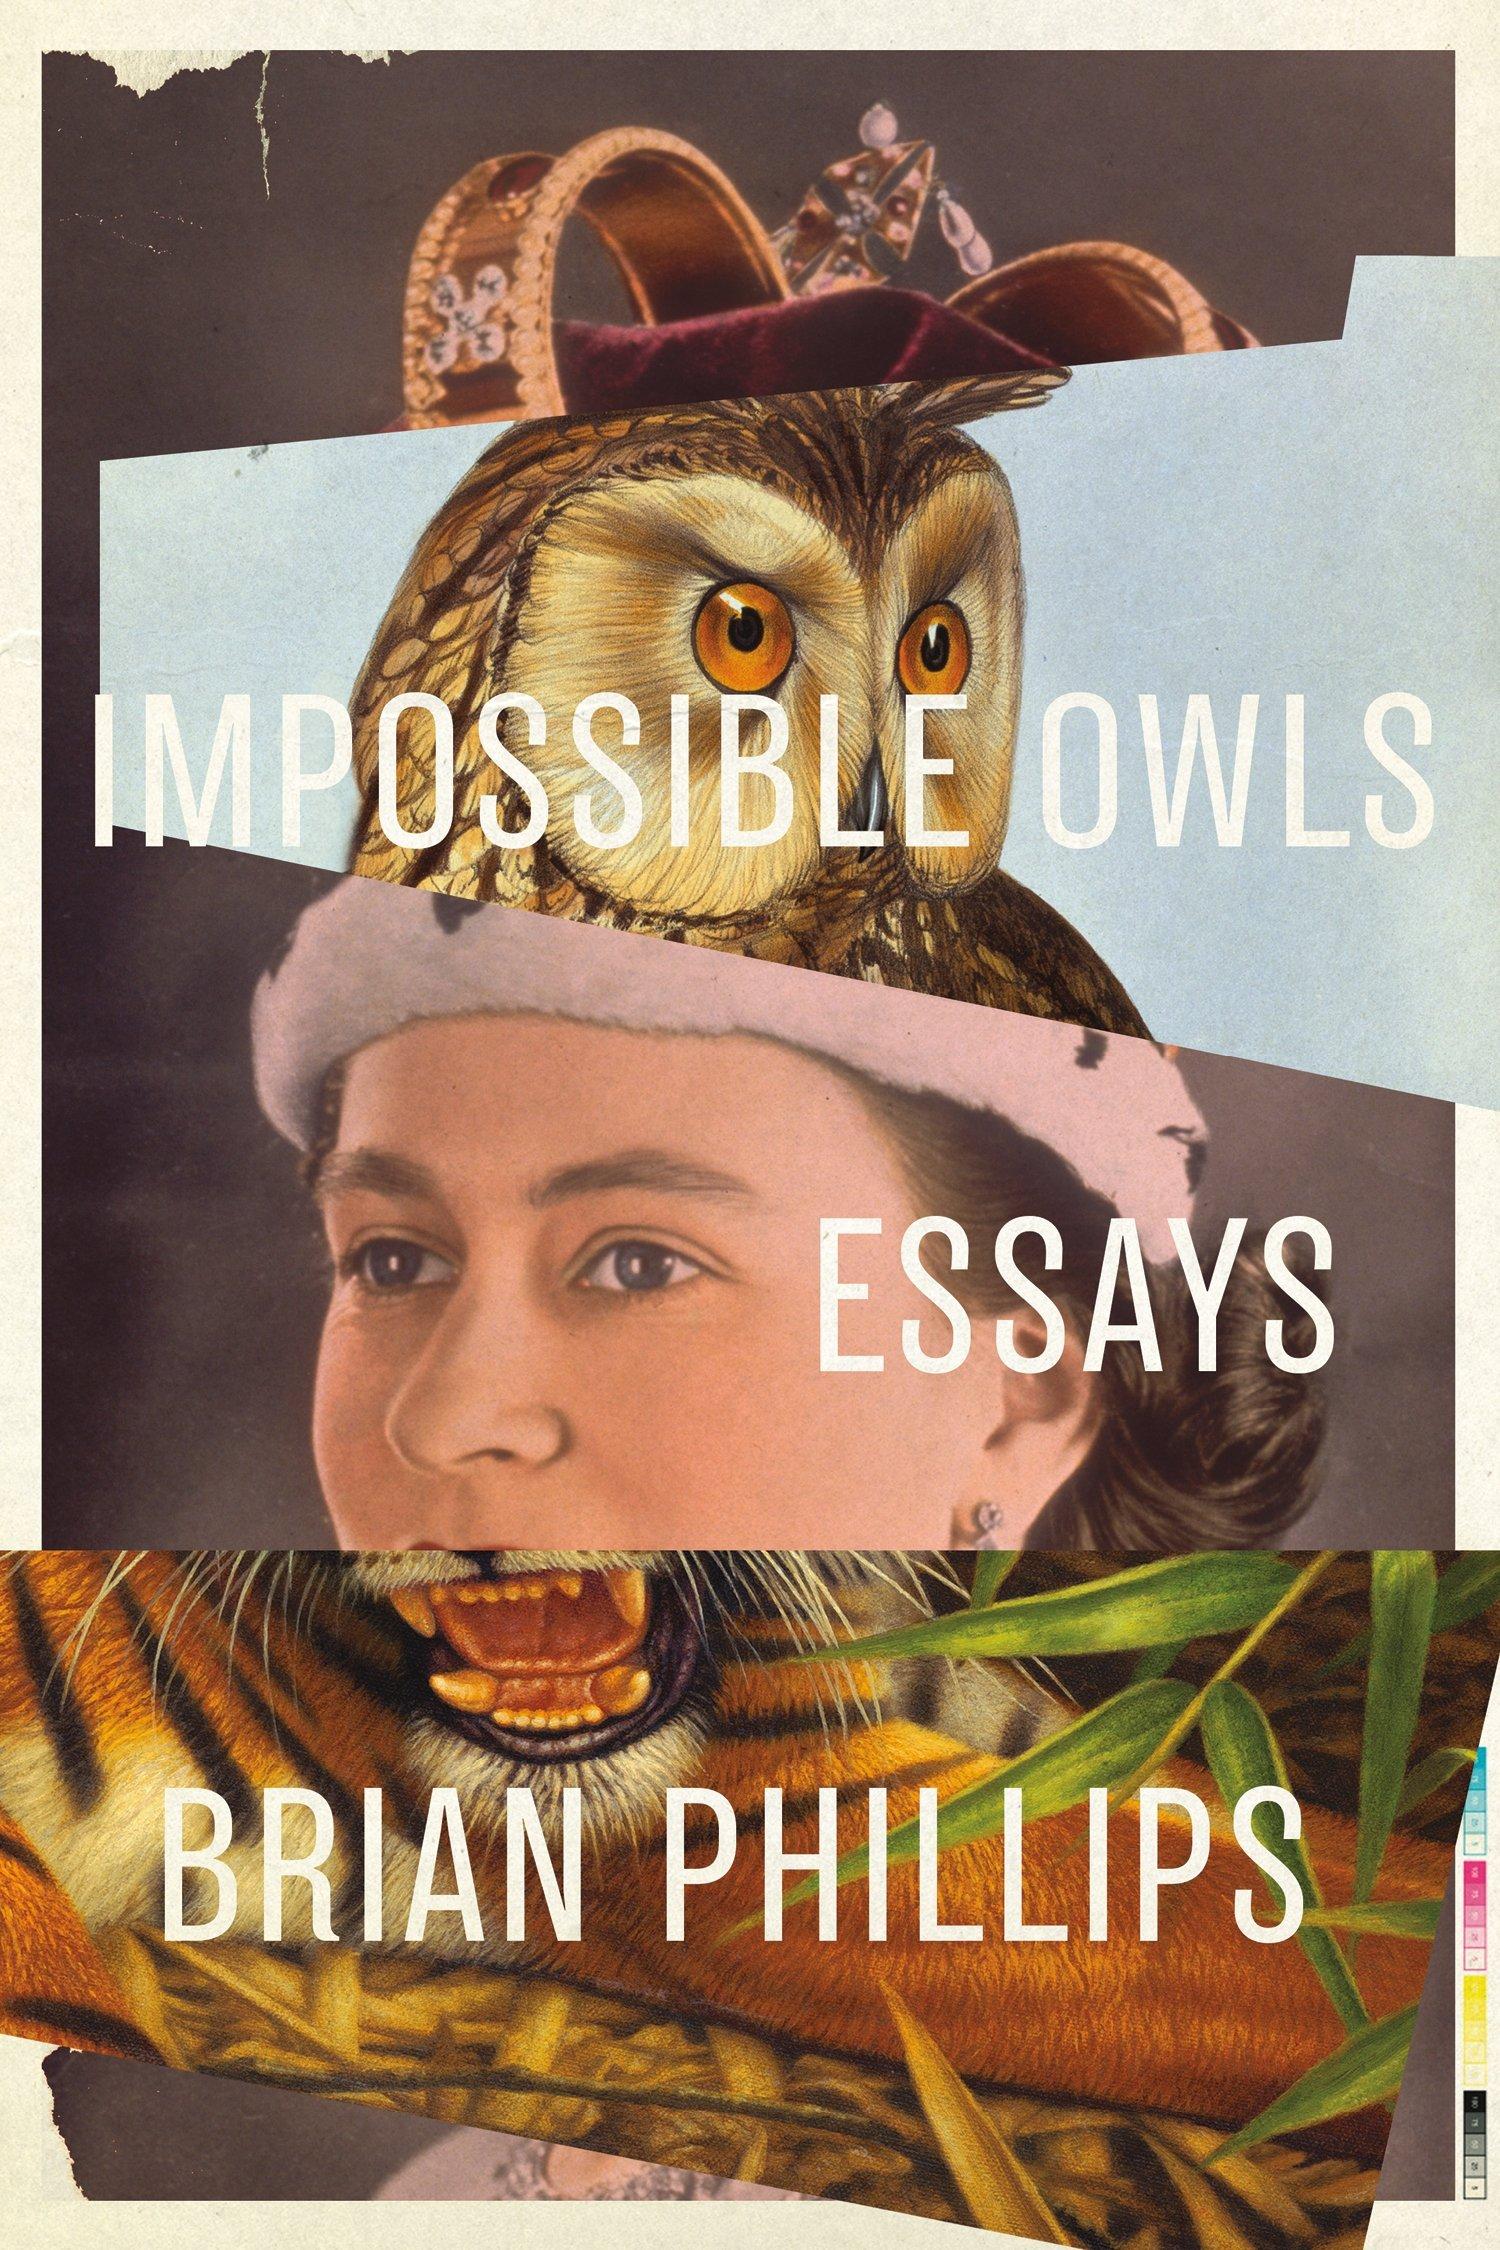 Impossible Owls: Essays: Brian Phillips: 9780374175337: Amazon.com: Books